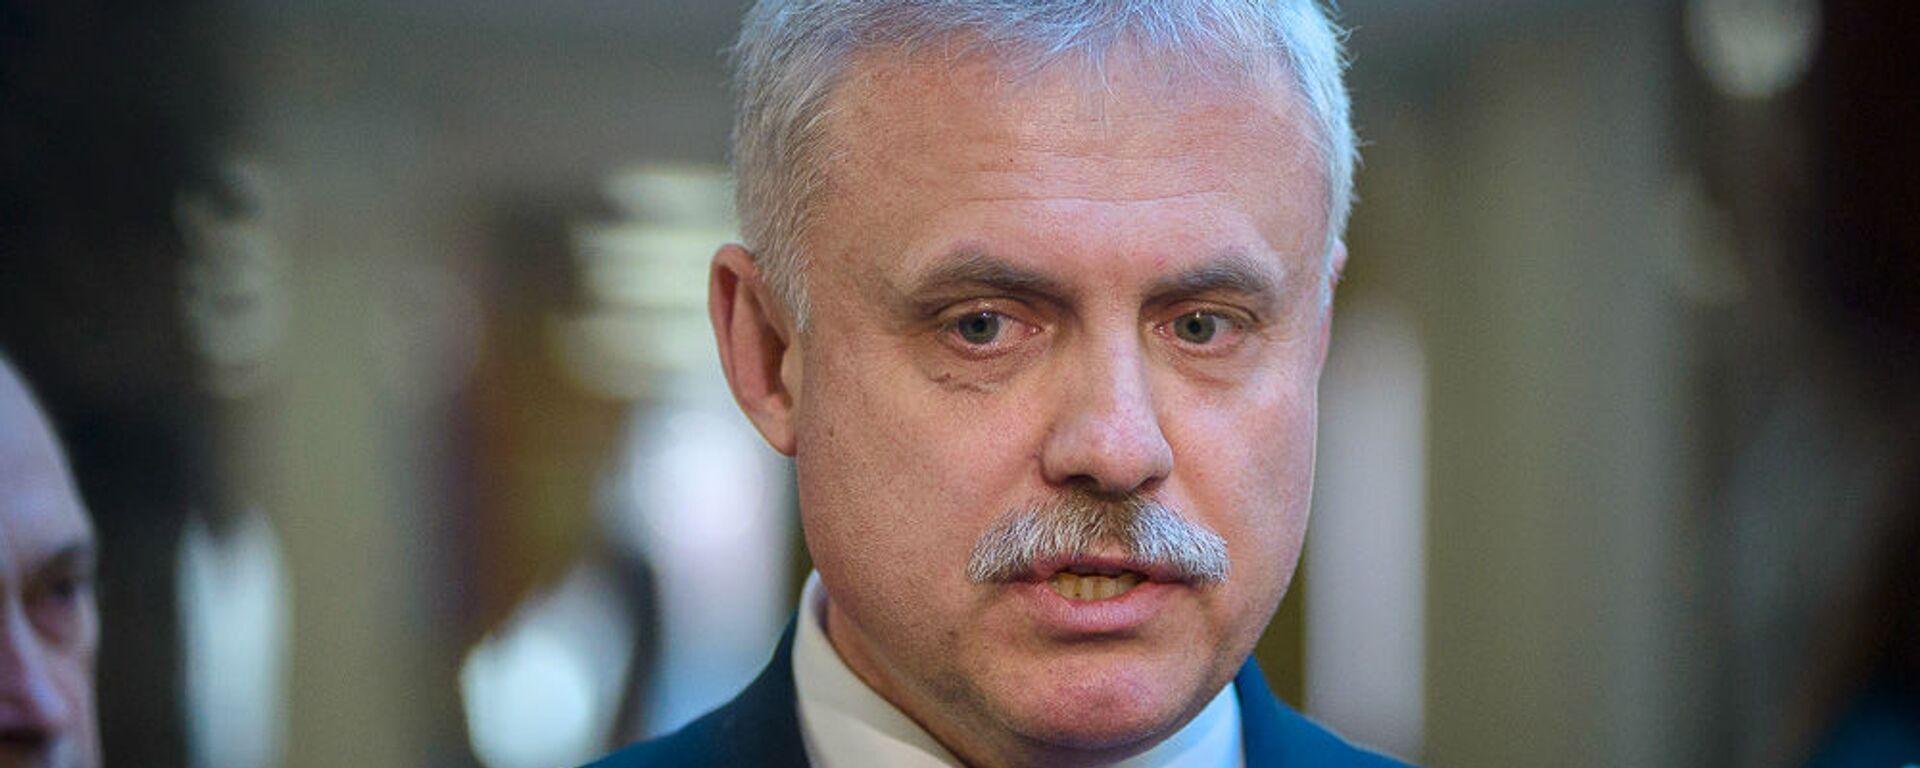 Секретарь Совета безопасности Беларуси Станислав Зась - Sputnik Таджикистан, 1920, 19.05.2021